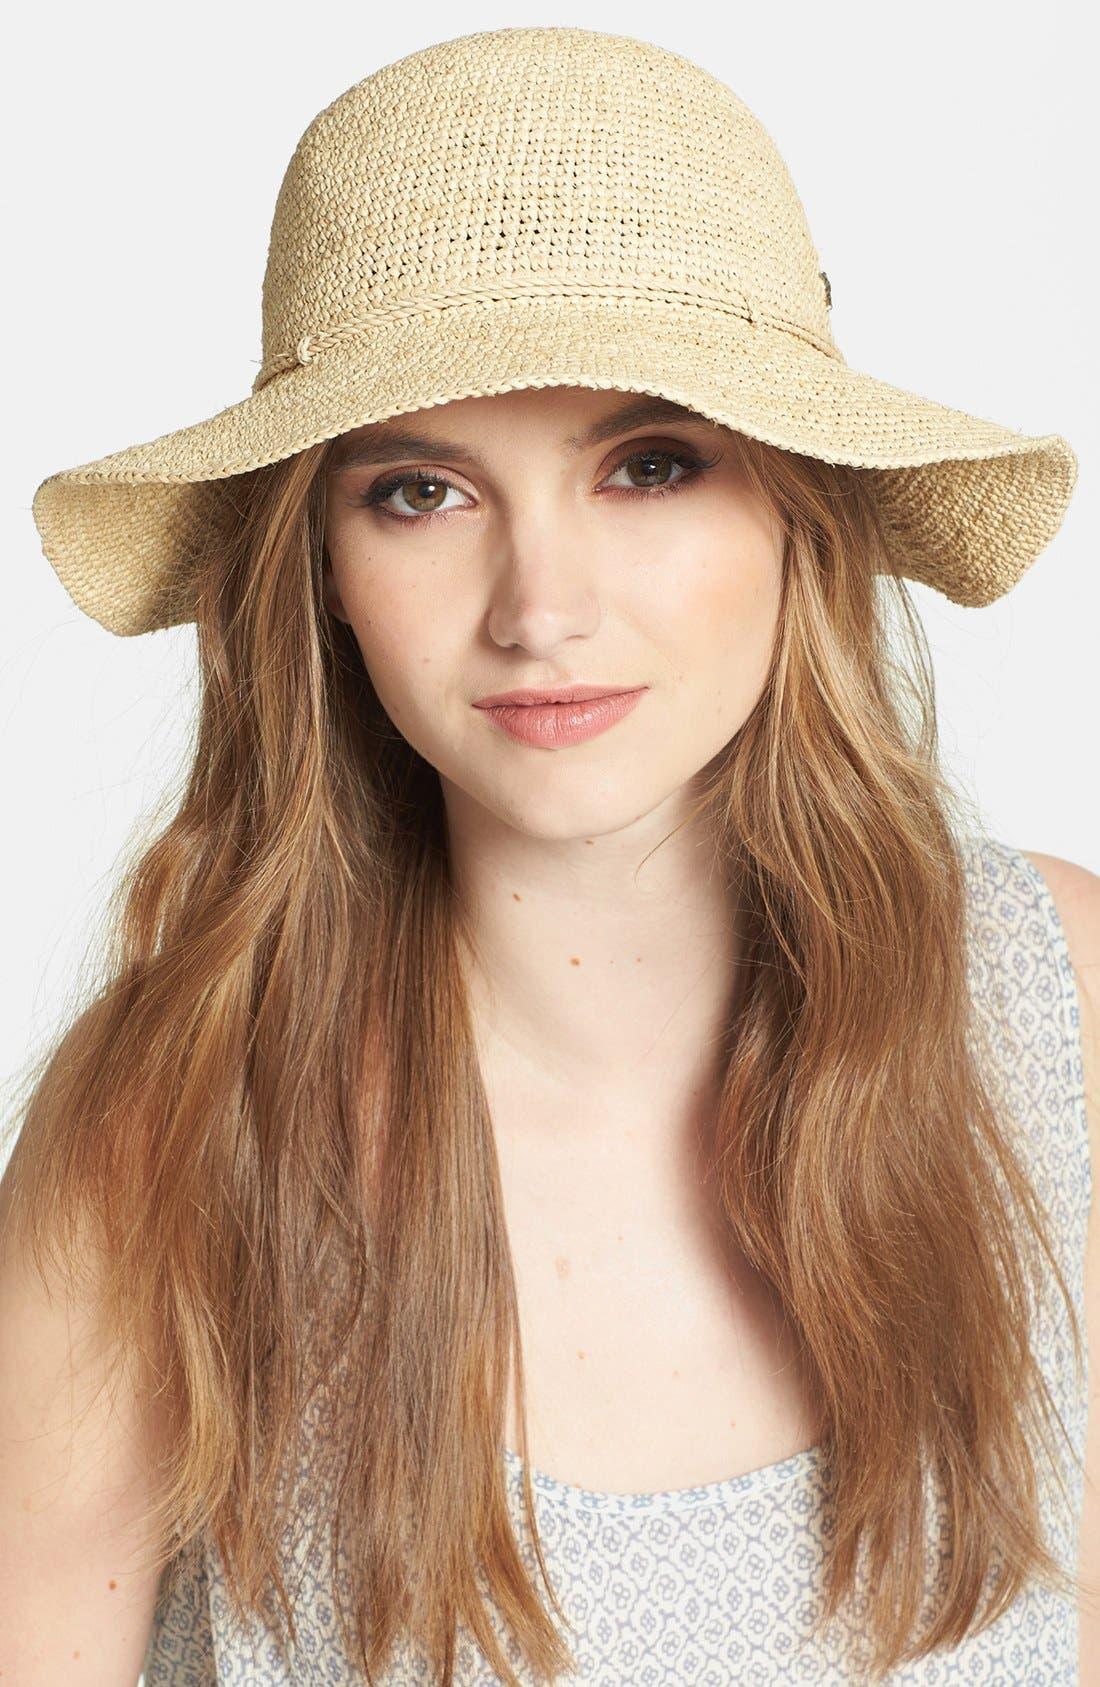 'Caicos' Raffia Hat,                             Main thumbnail 1, color,                             250